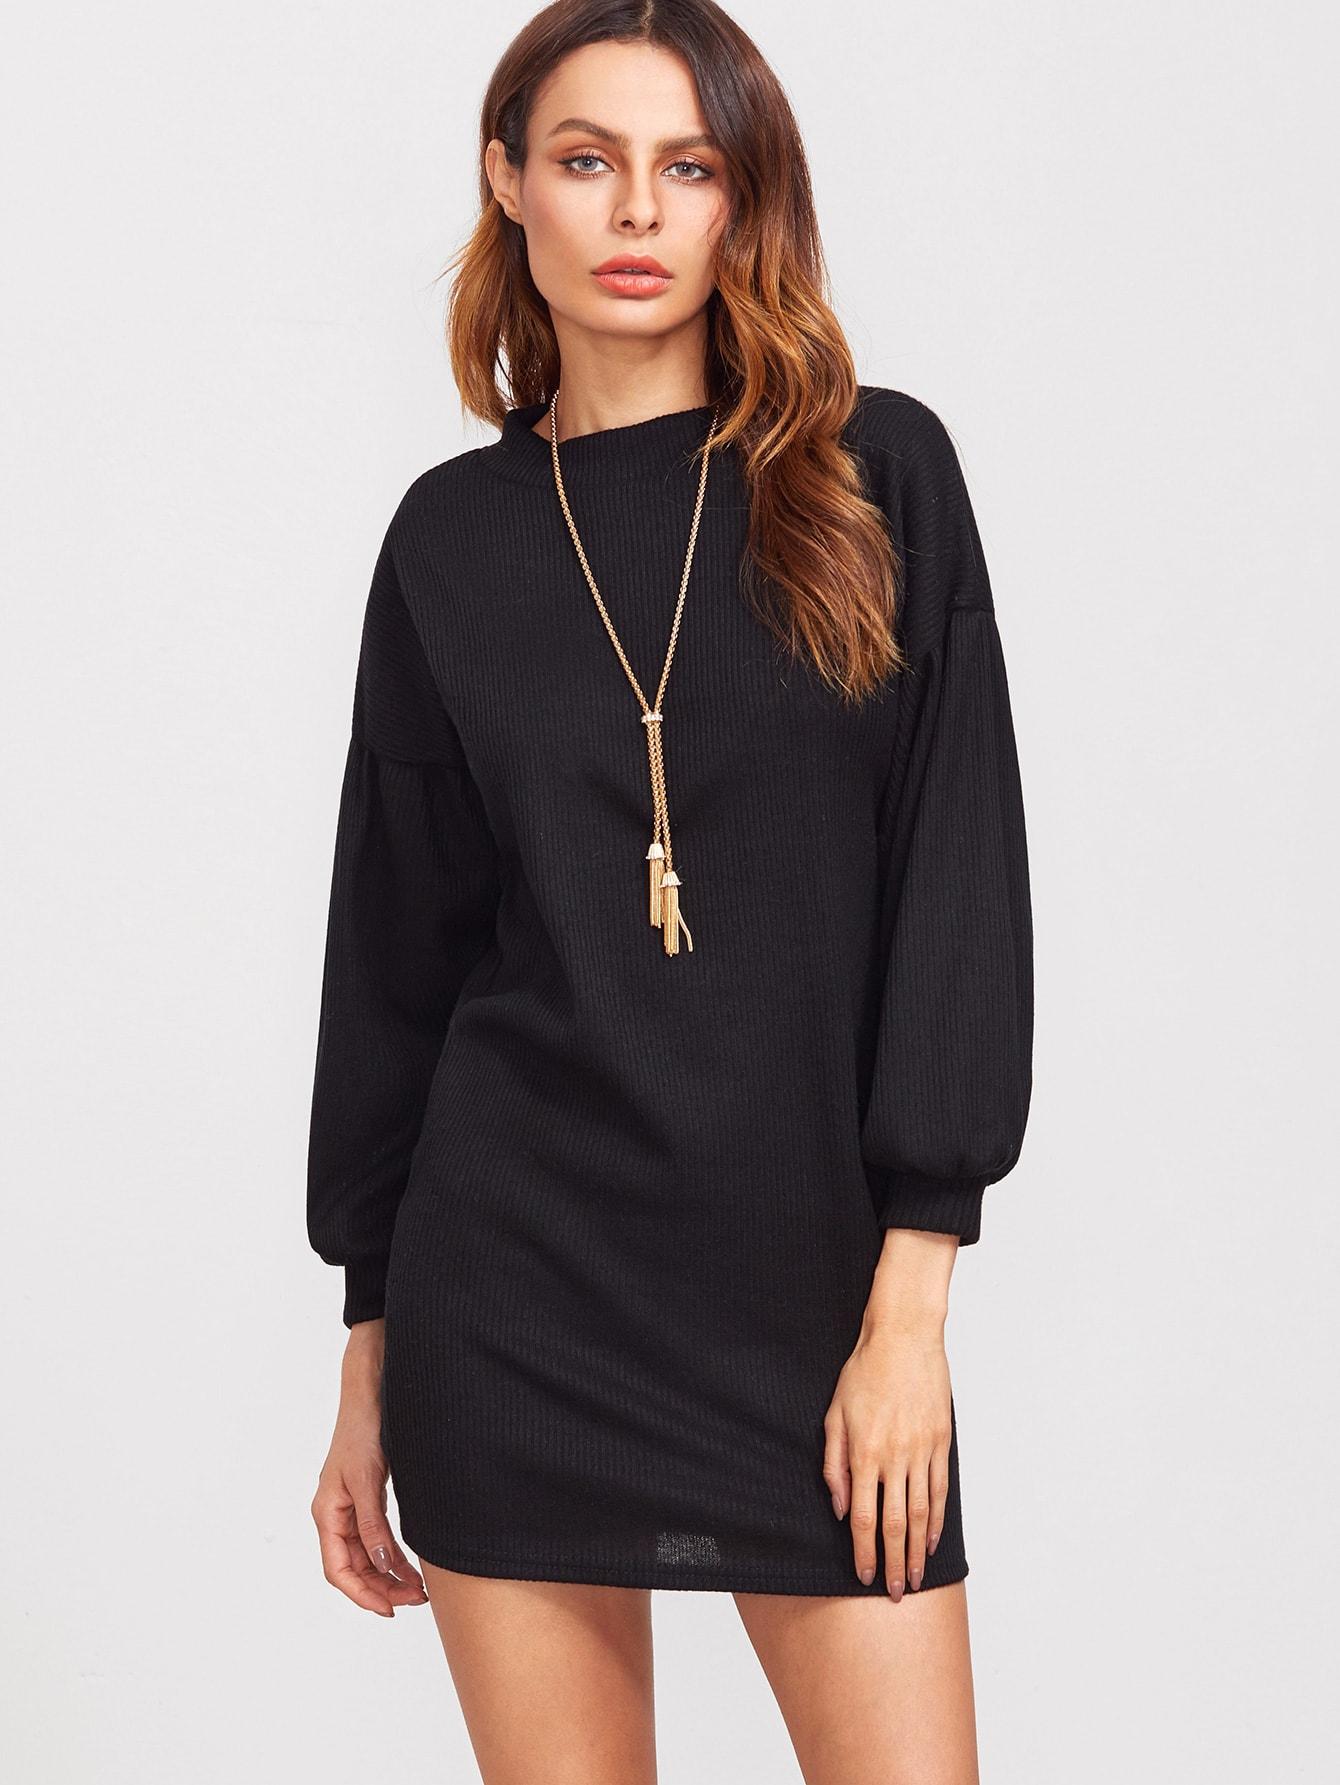 Black Dropped Shoulder Seam Lantern Sleeve Sweater Dress RDRE161230101